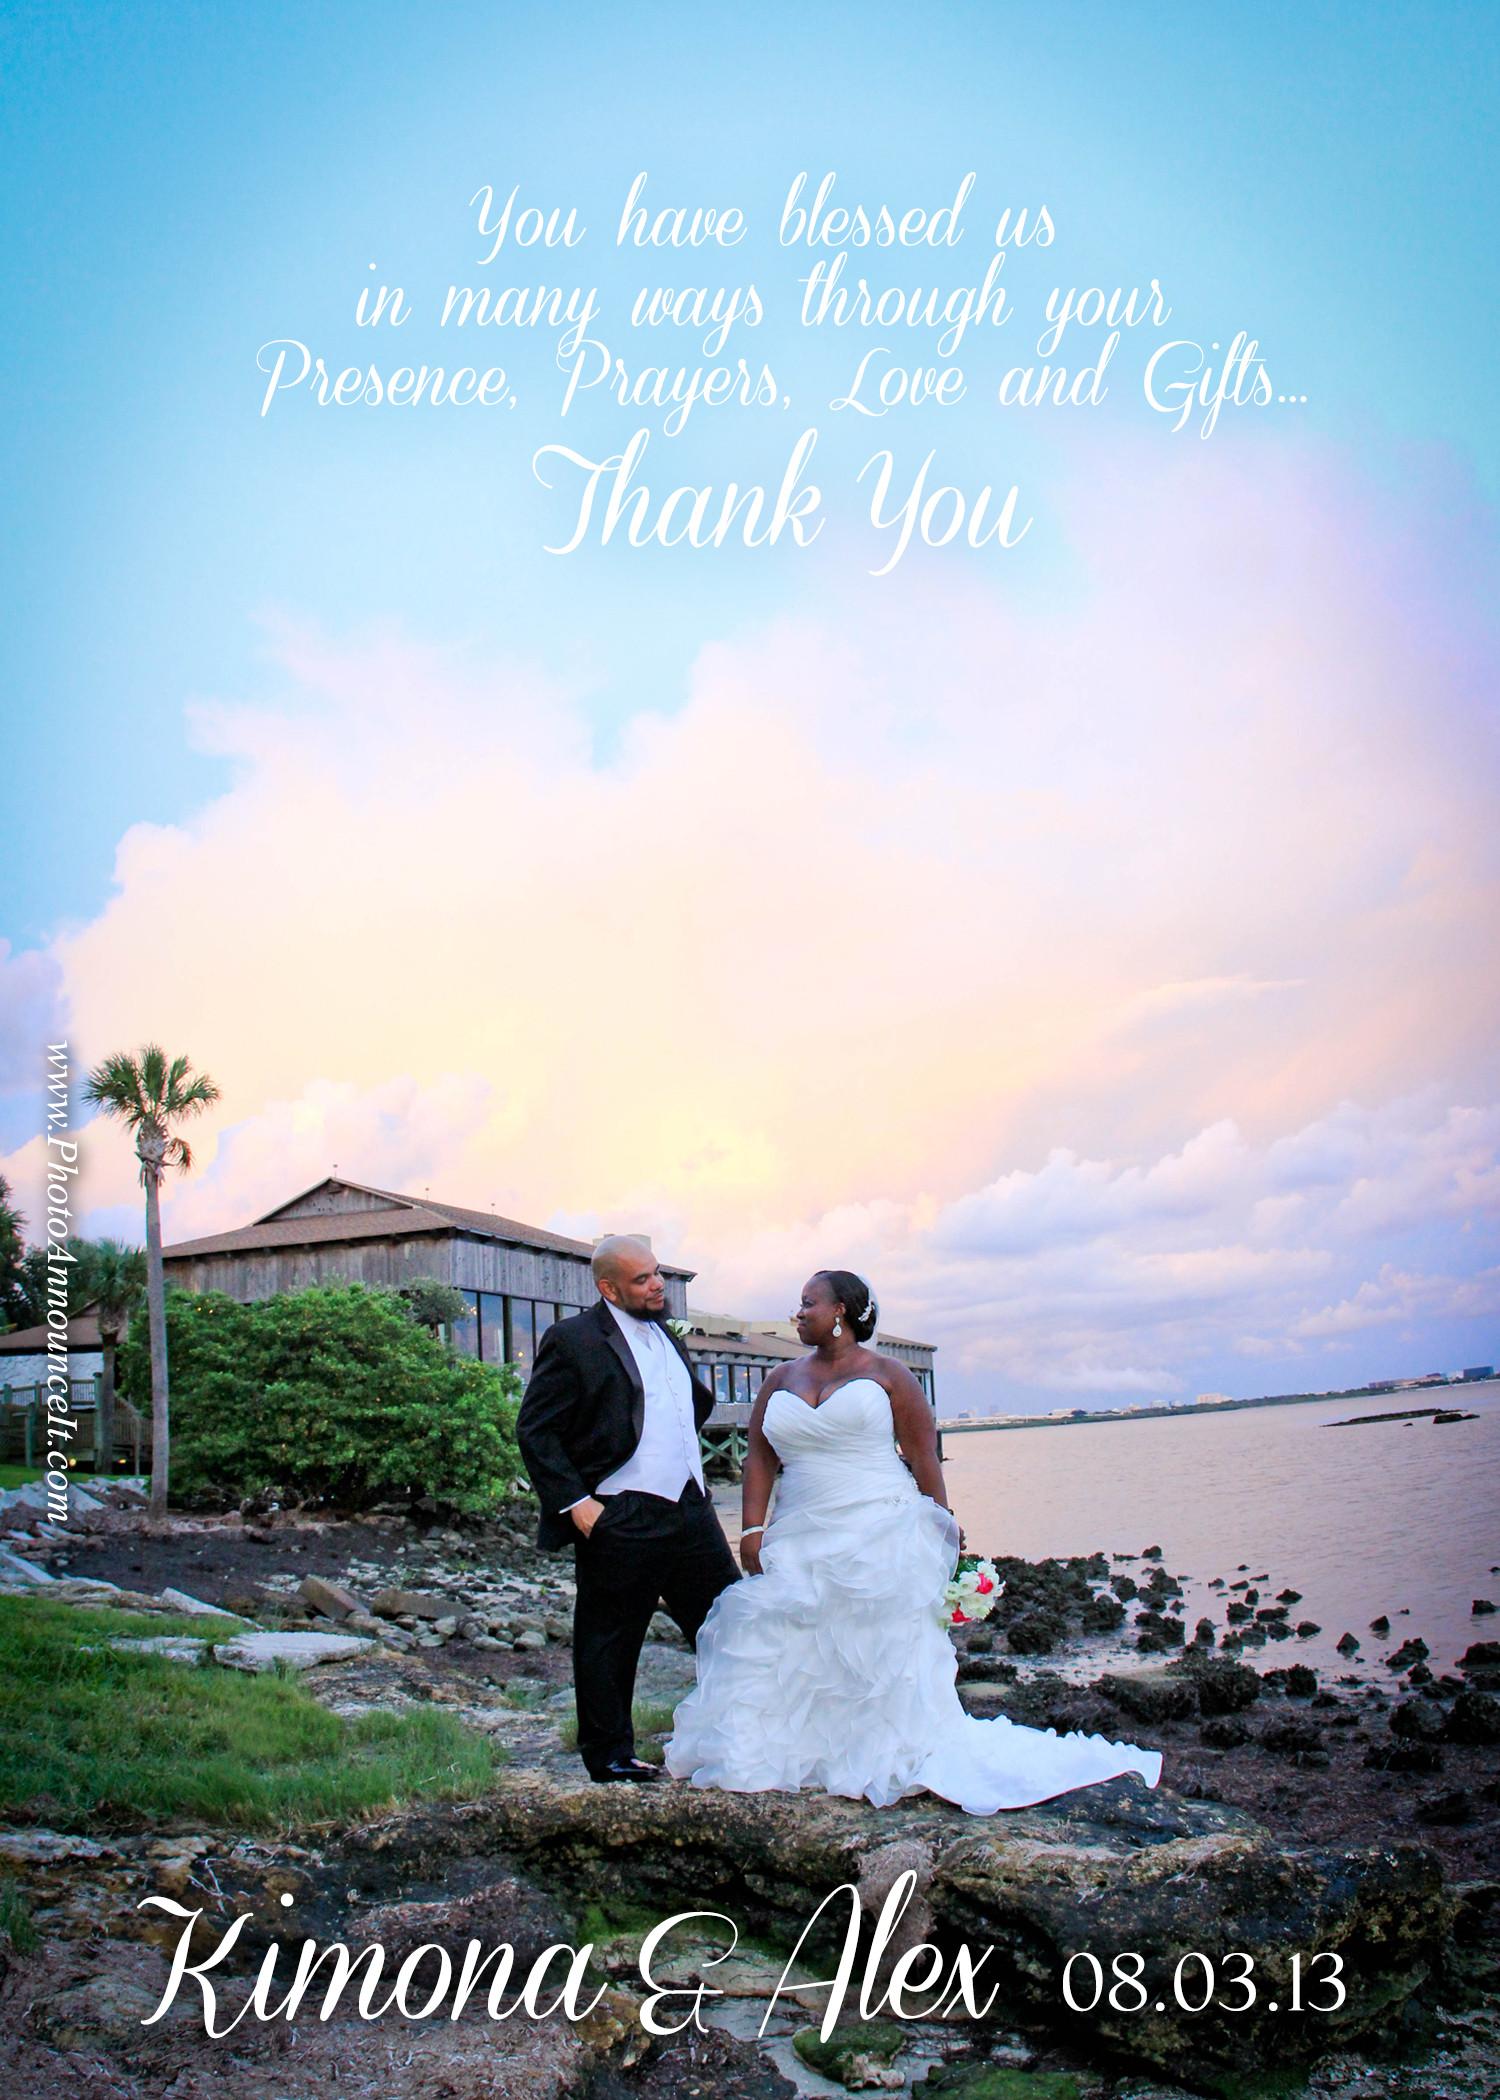 wedding thank you card ideas